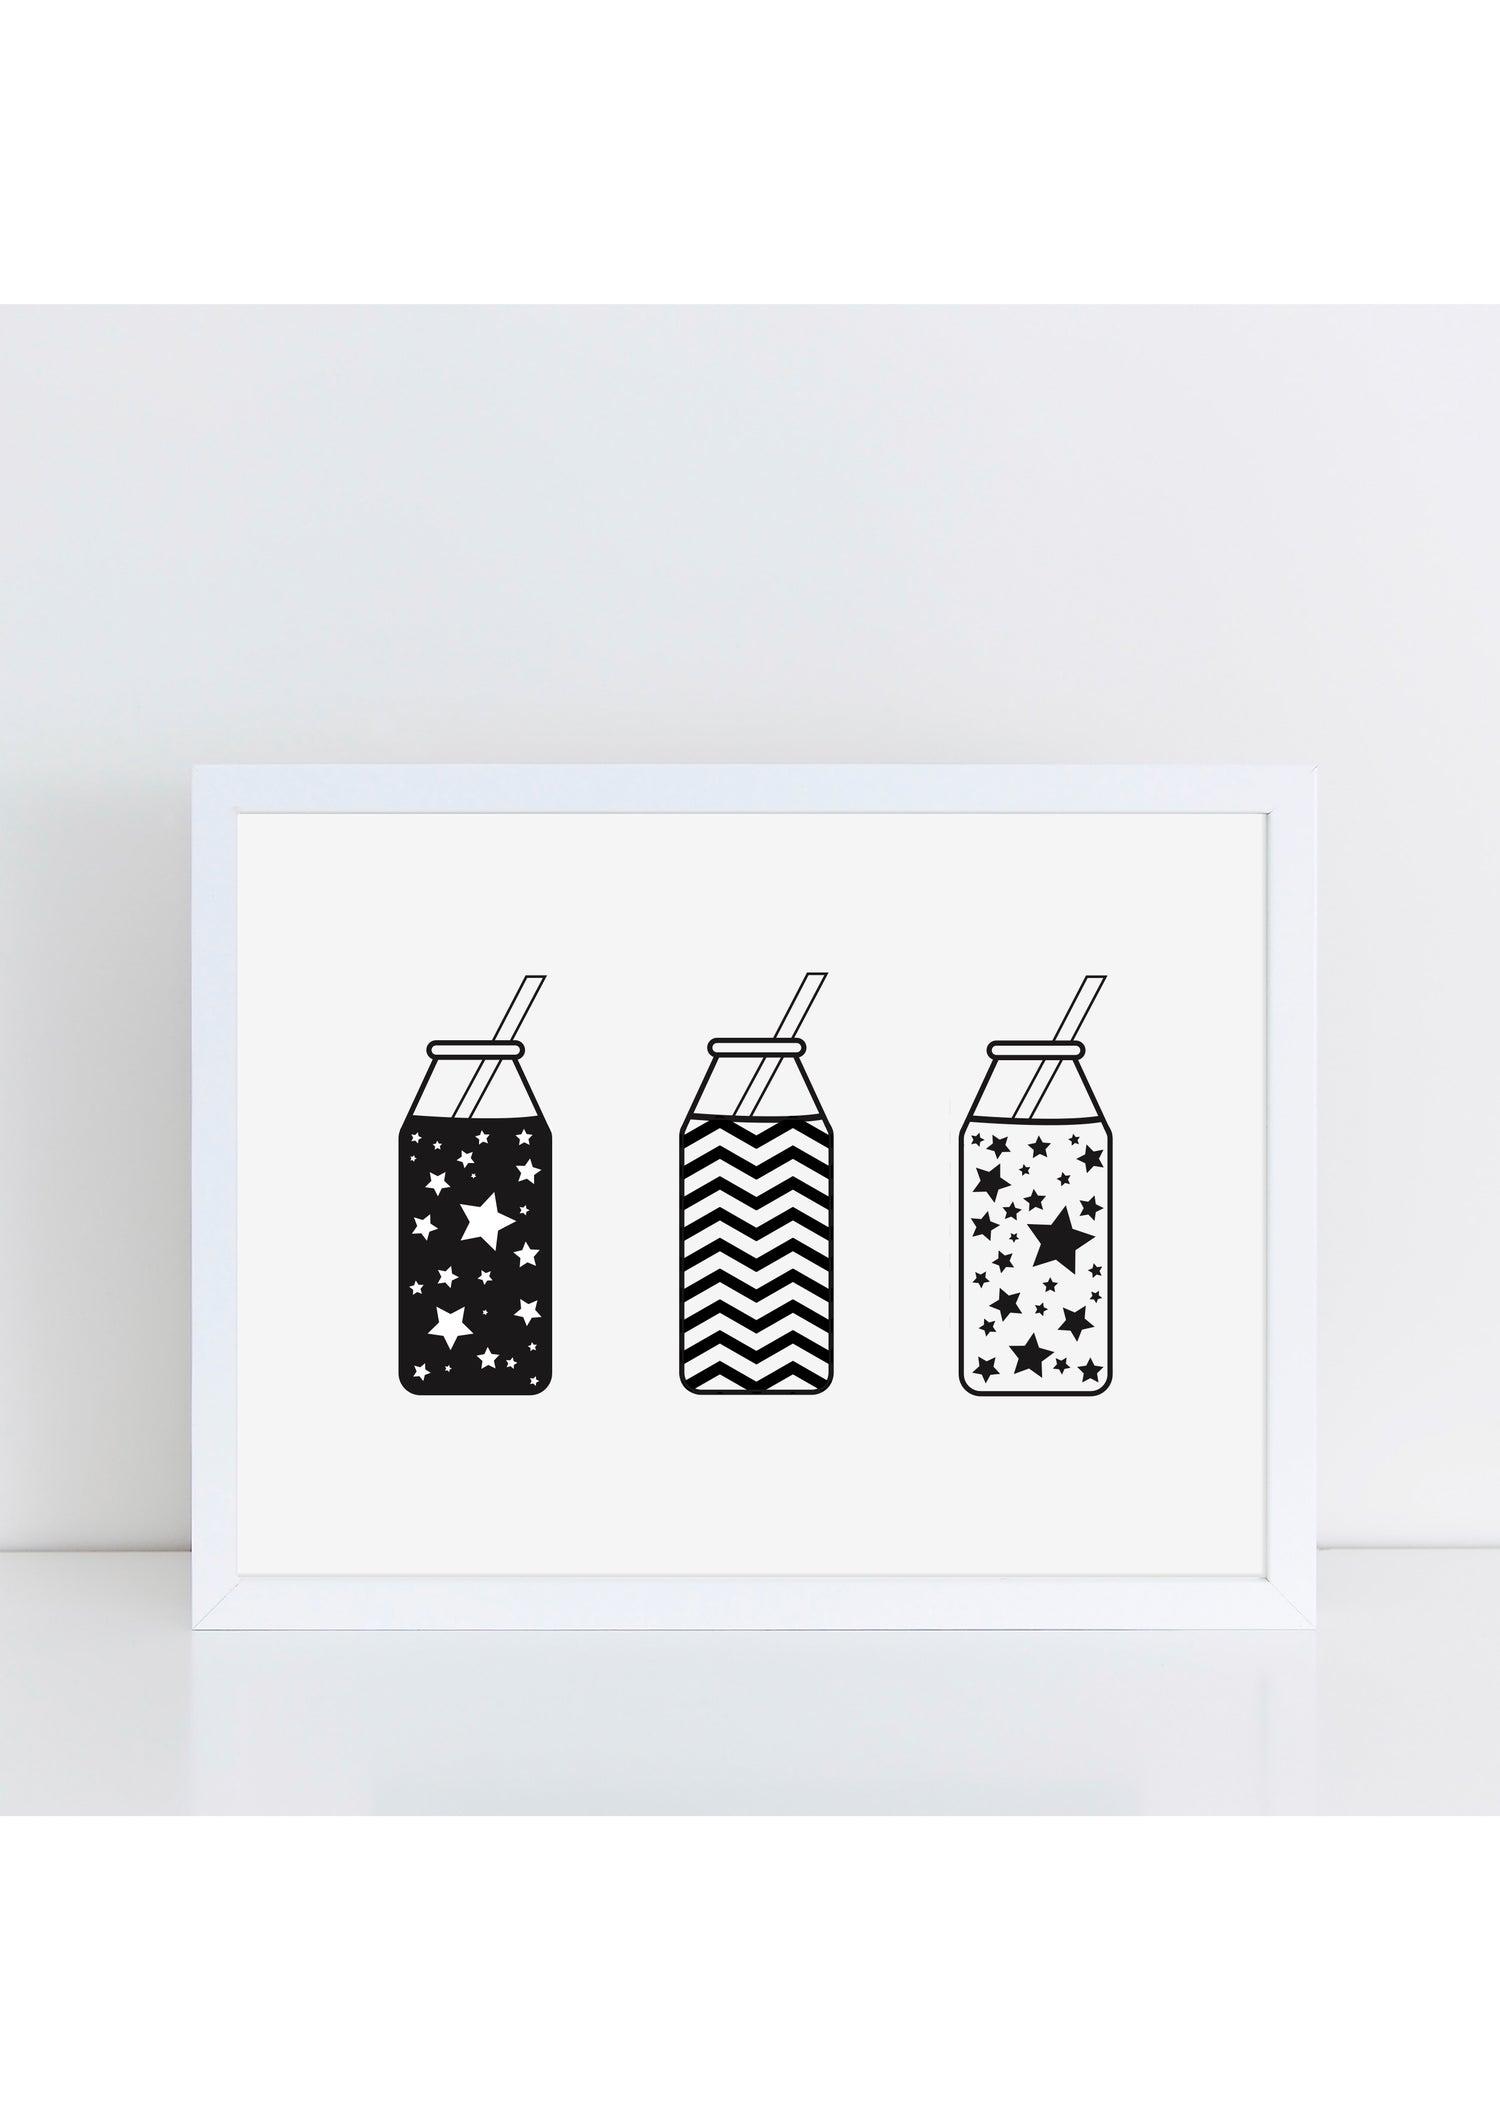 Image of Monochrome Milk Bottle Print by The Little Jones